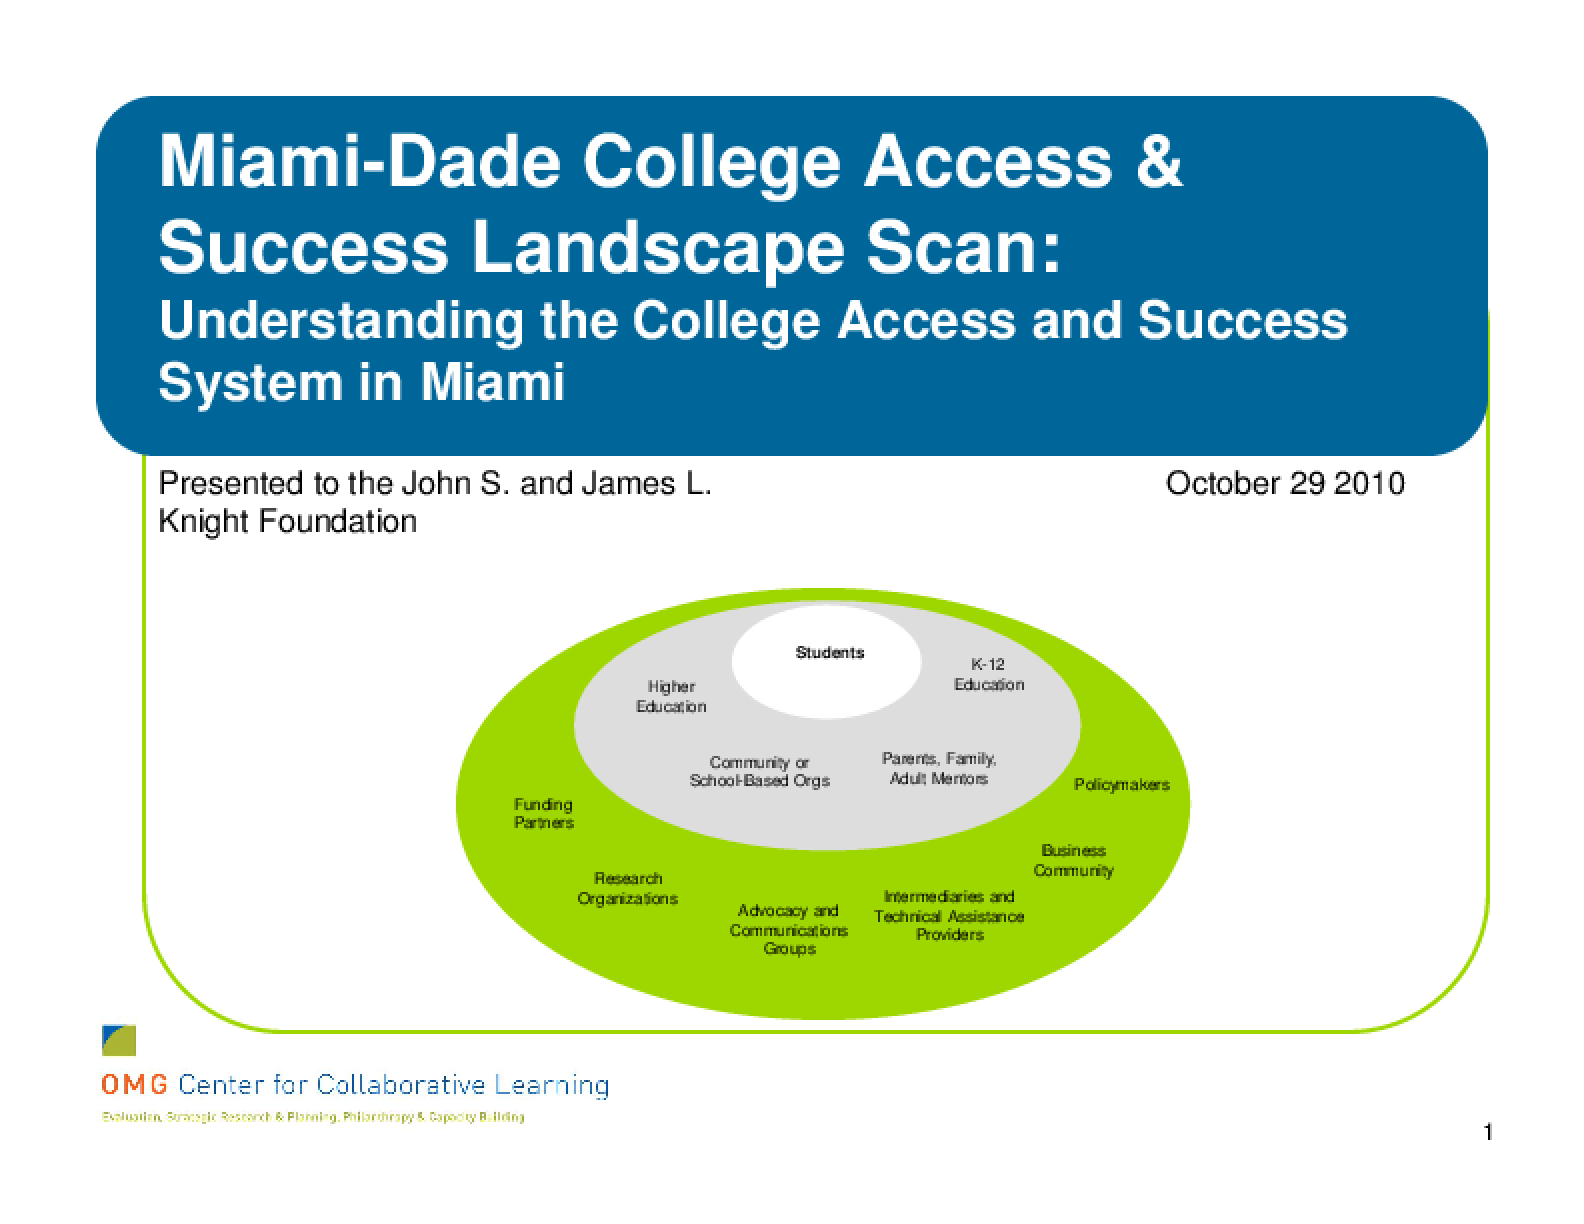 Miami-Dade College Access & Success Landscape Scan: Understanding